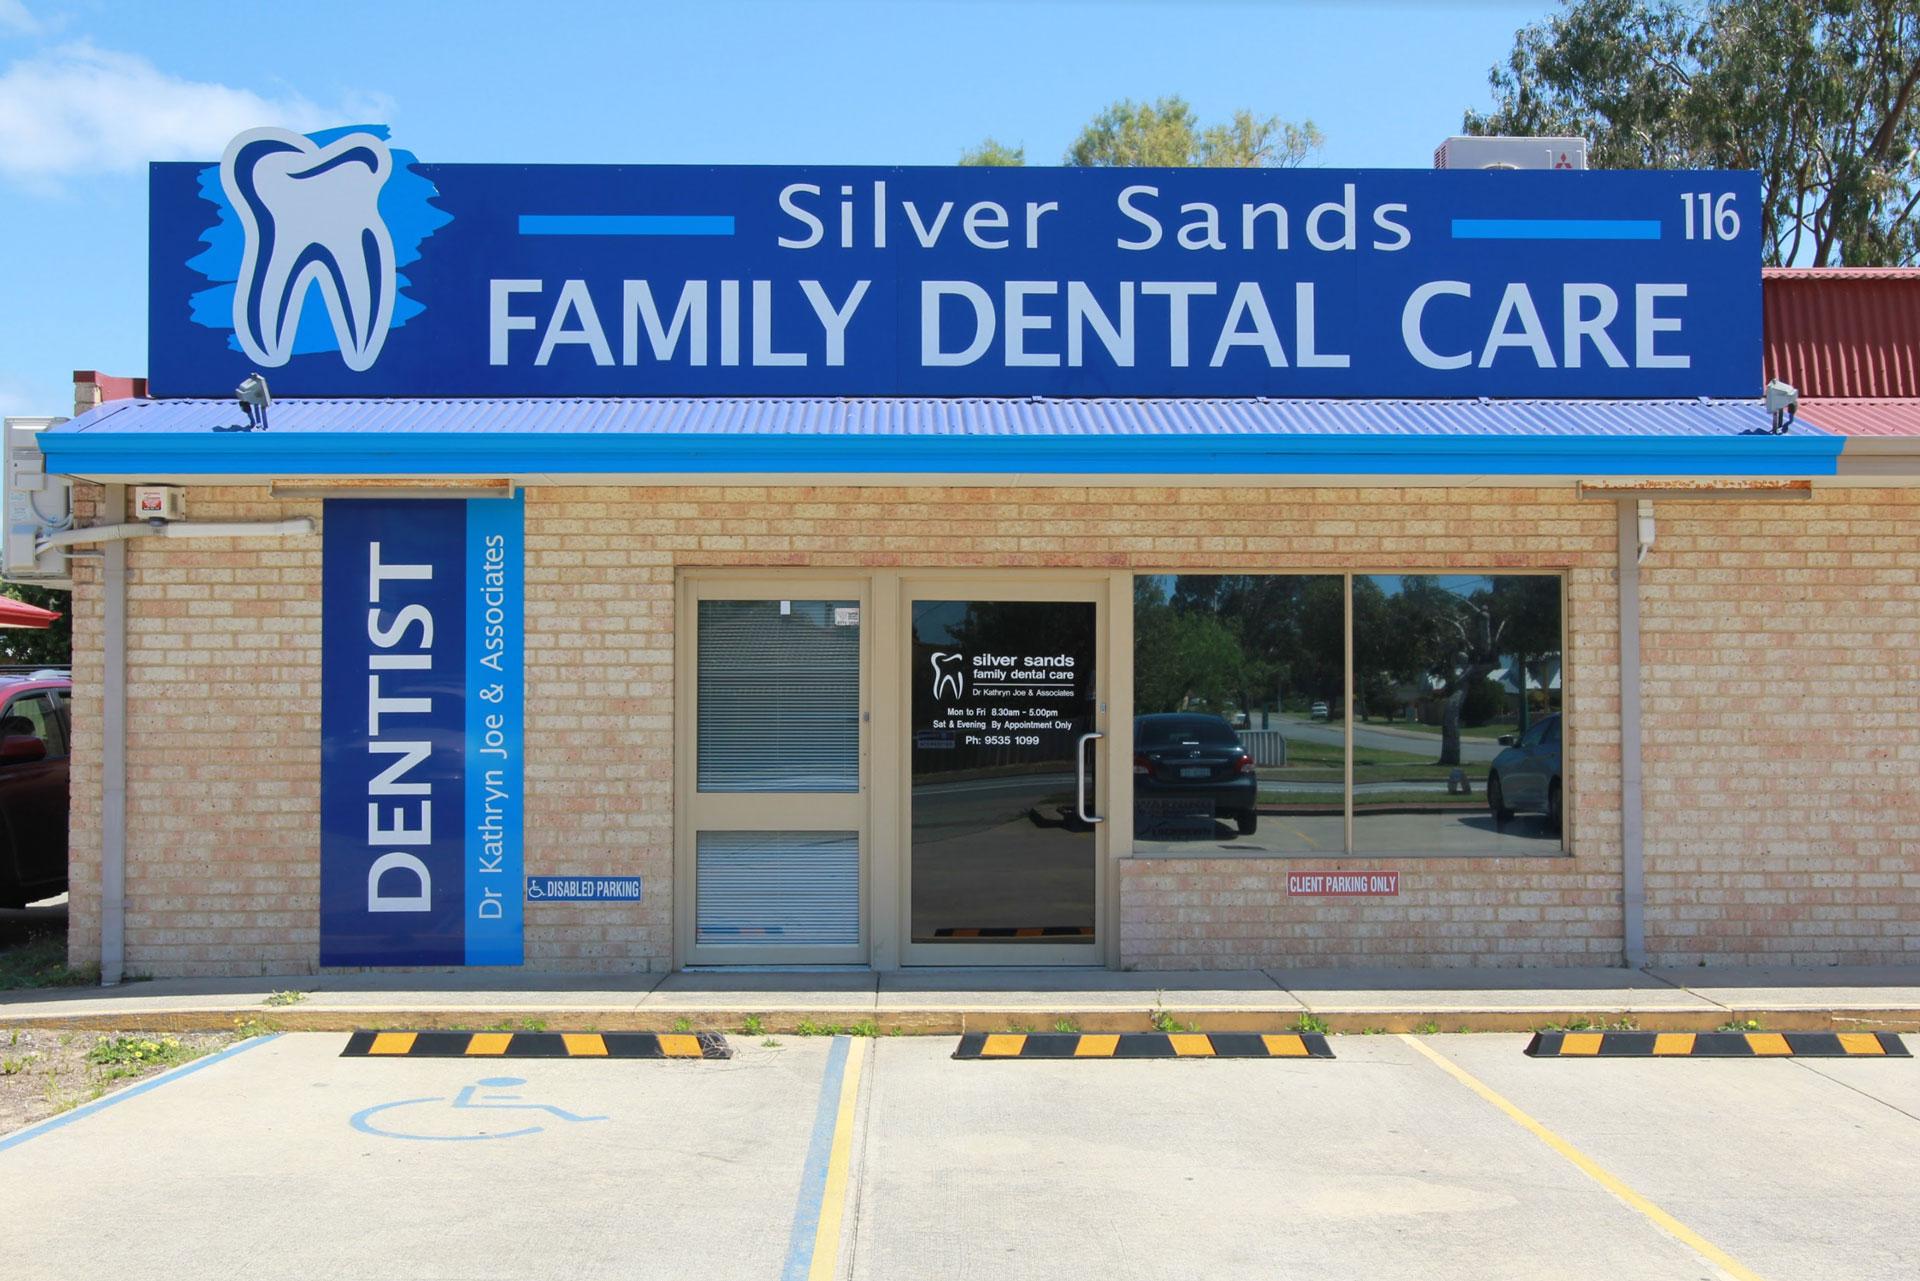 Silver Sands Family Dental